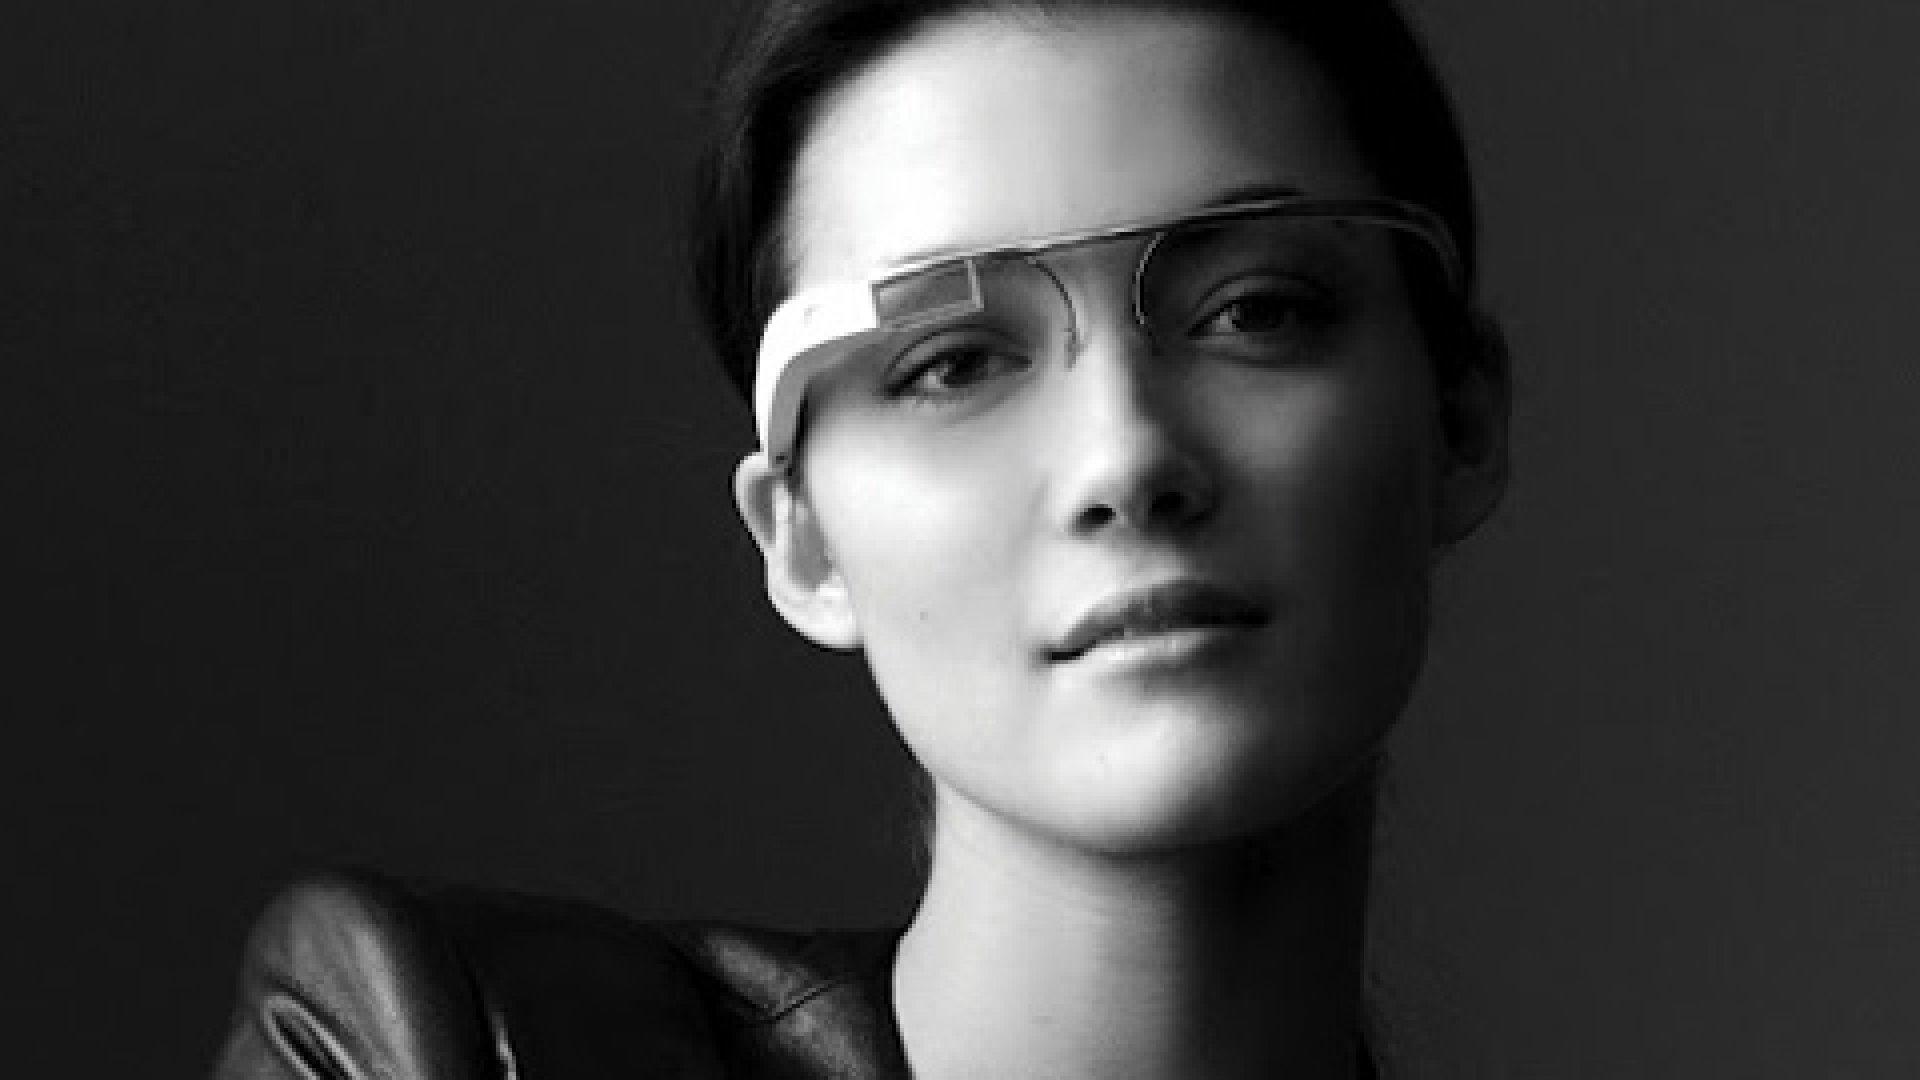 Google's prototype for reality-augmented eyeglasses.